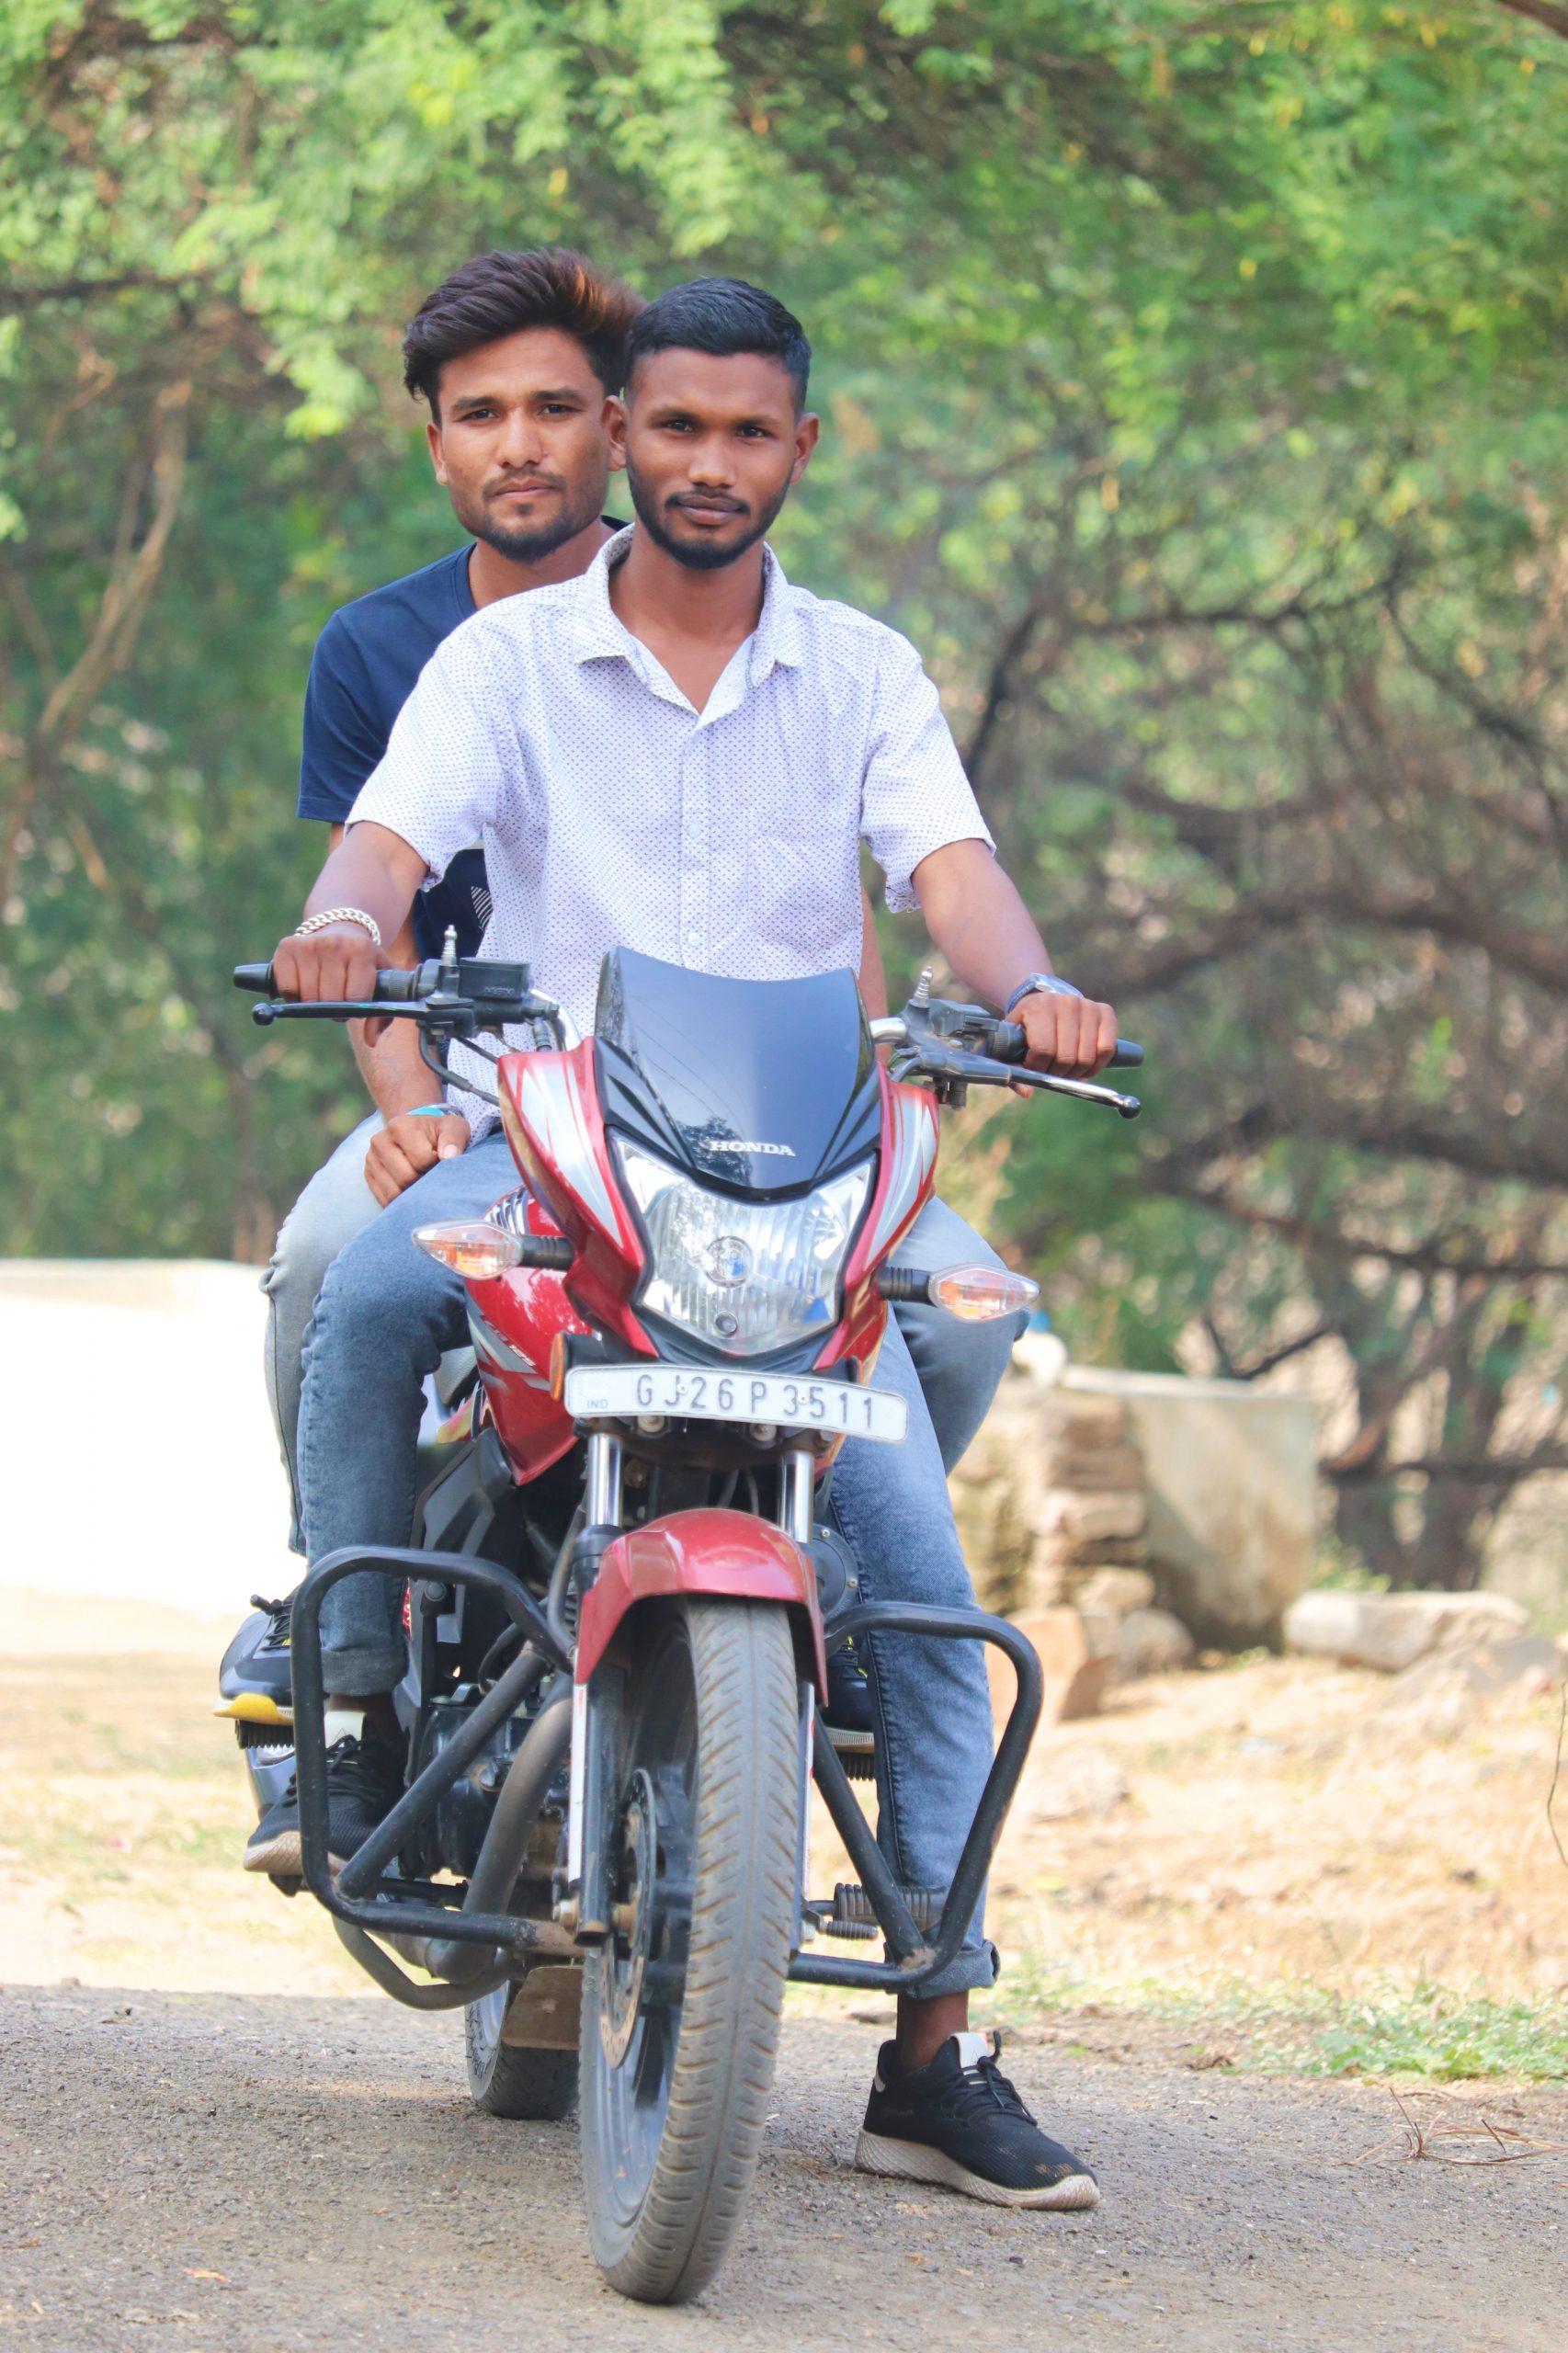 Two boys on bike